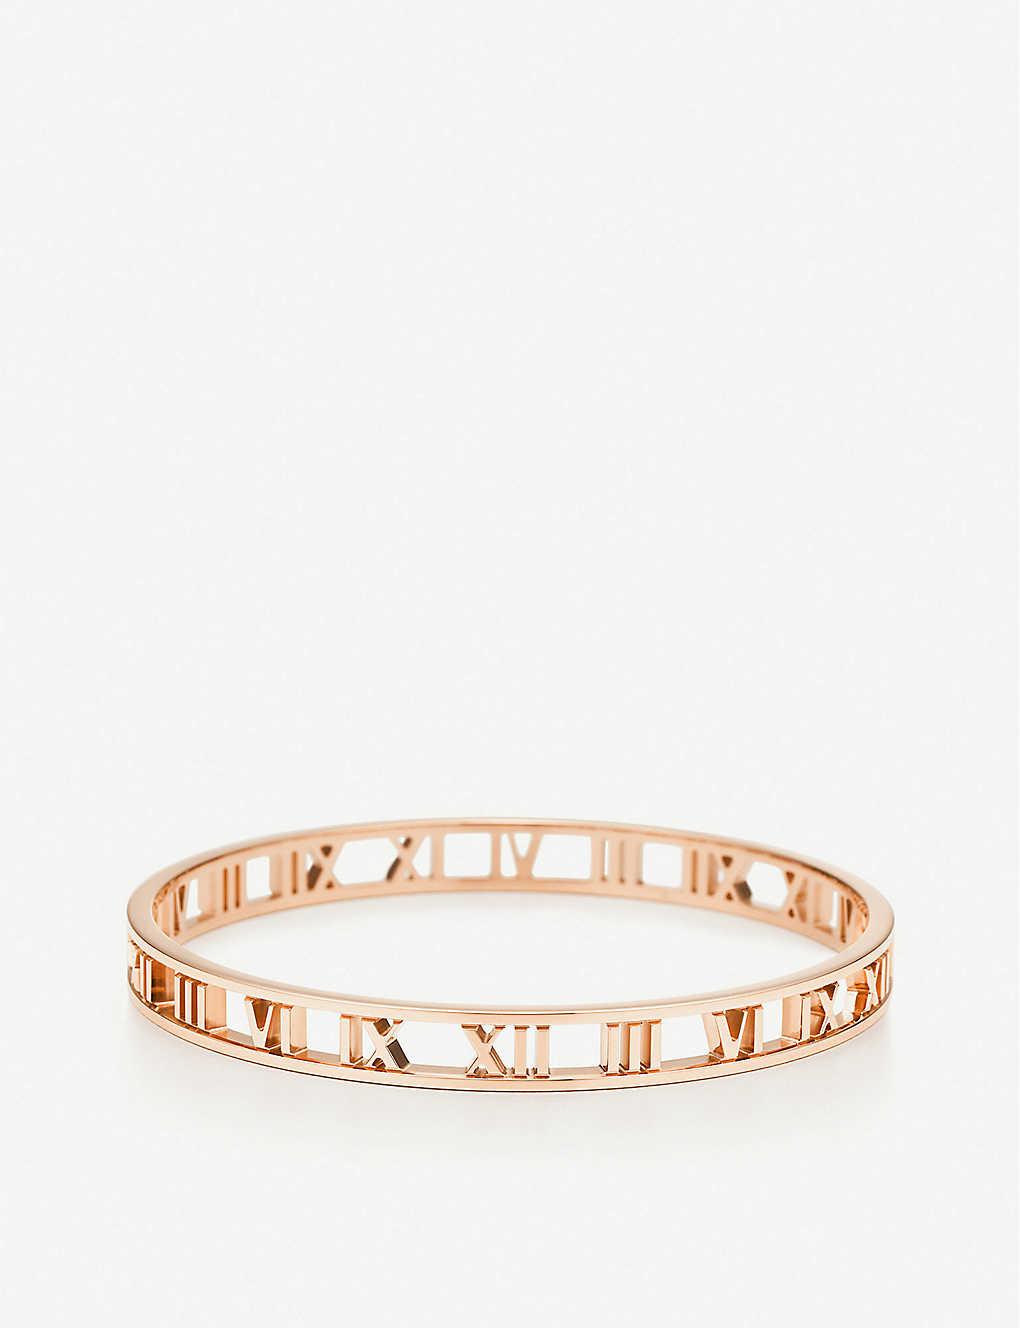 36c16db5b TIFFANY & CO - Atlas Roman numeral 18ct rose-gold narrow bangle ...